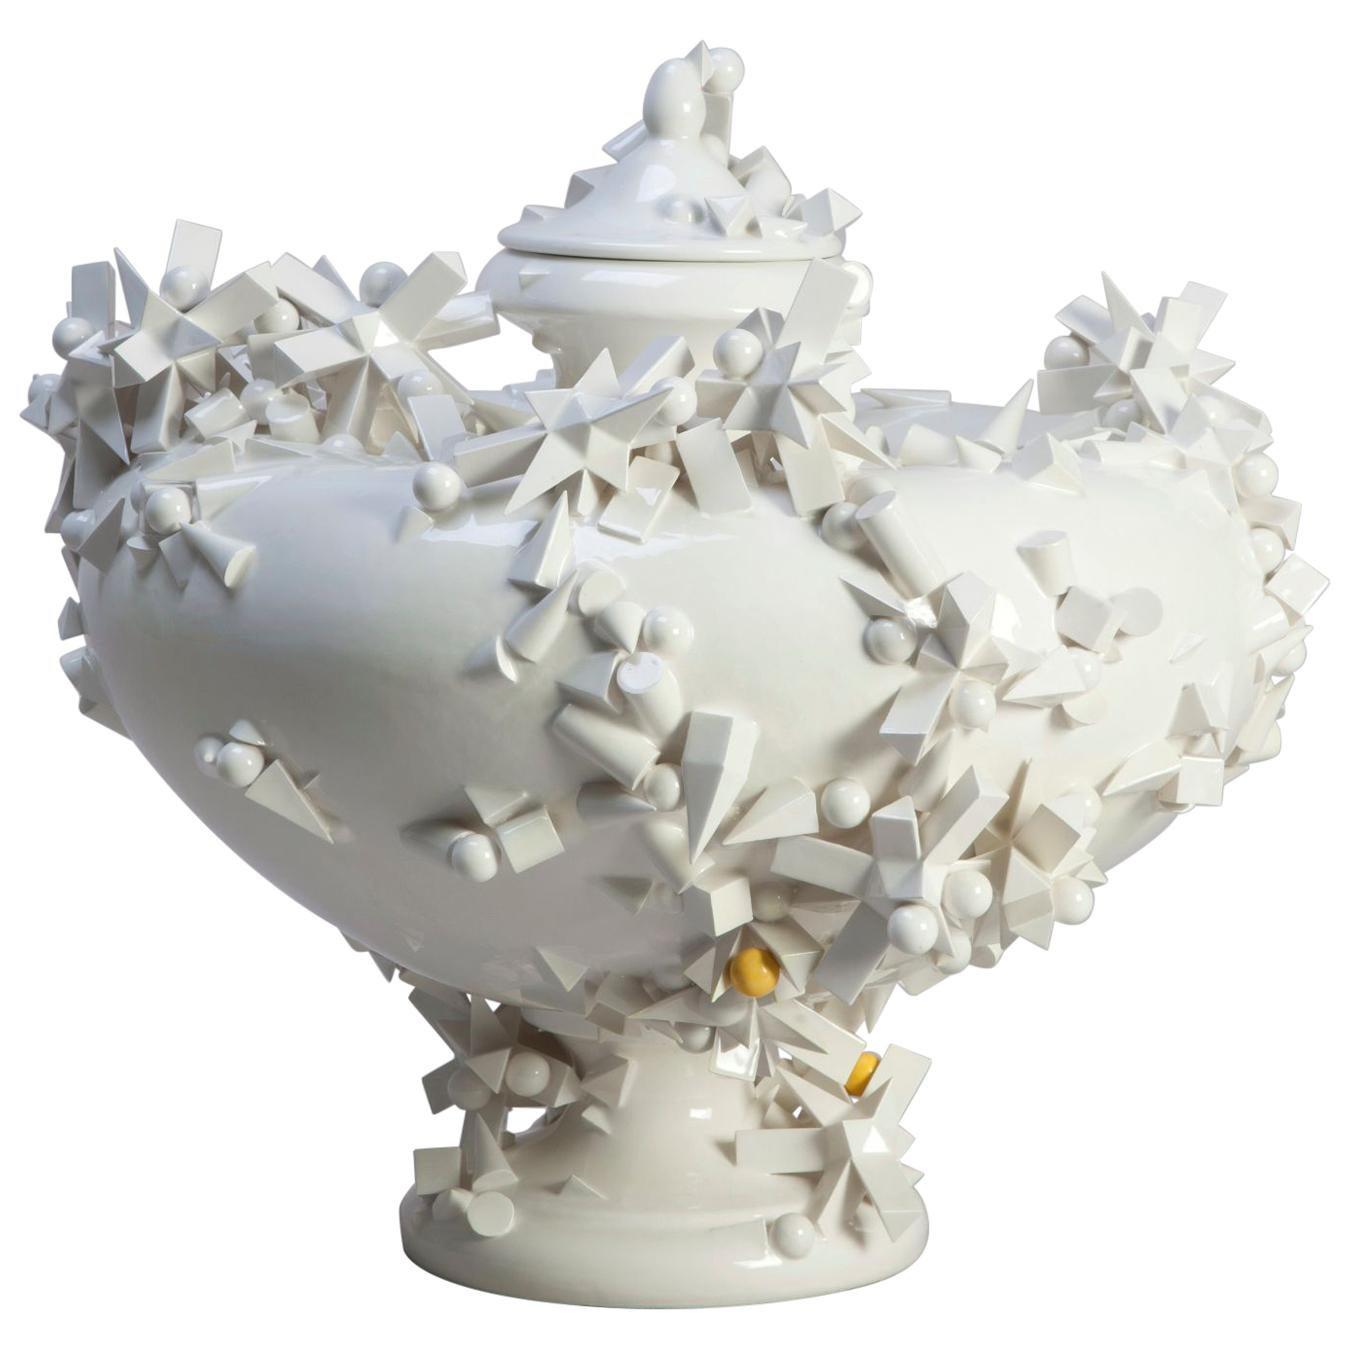 Urn by Andrea Salvatori, White Ceramic Sculpture 21st Century Contemporary